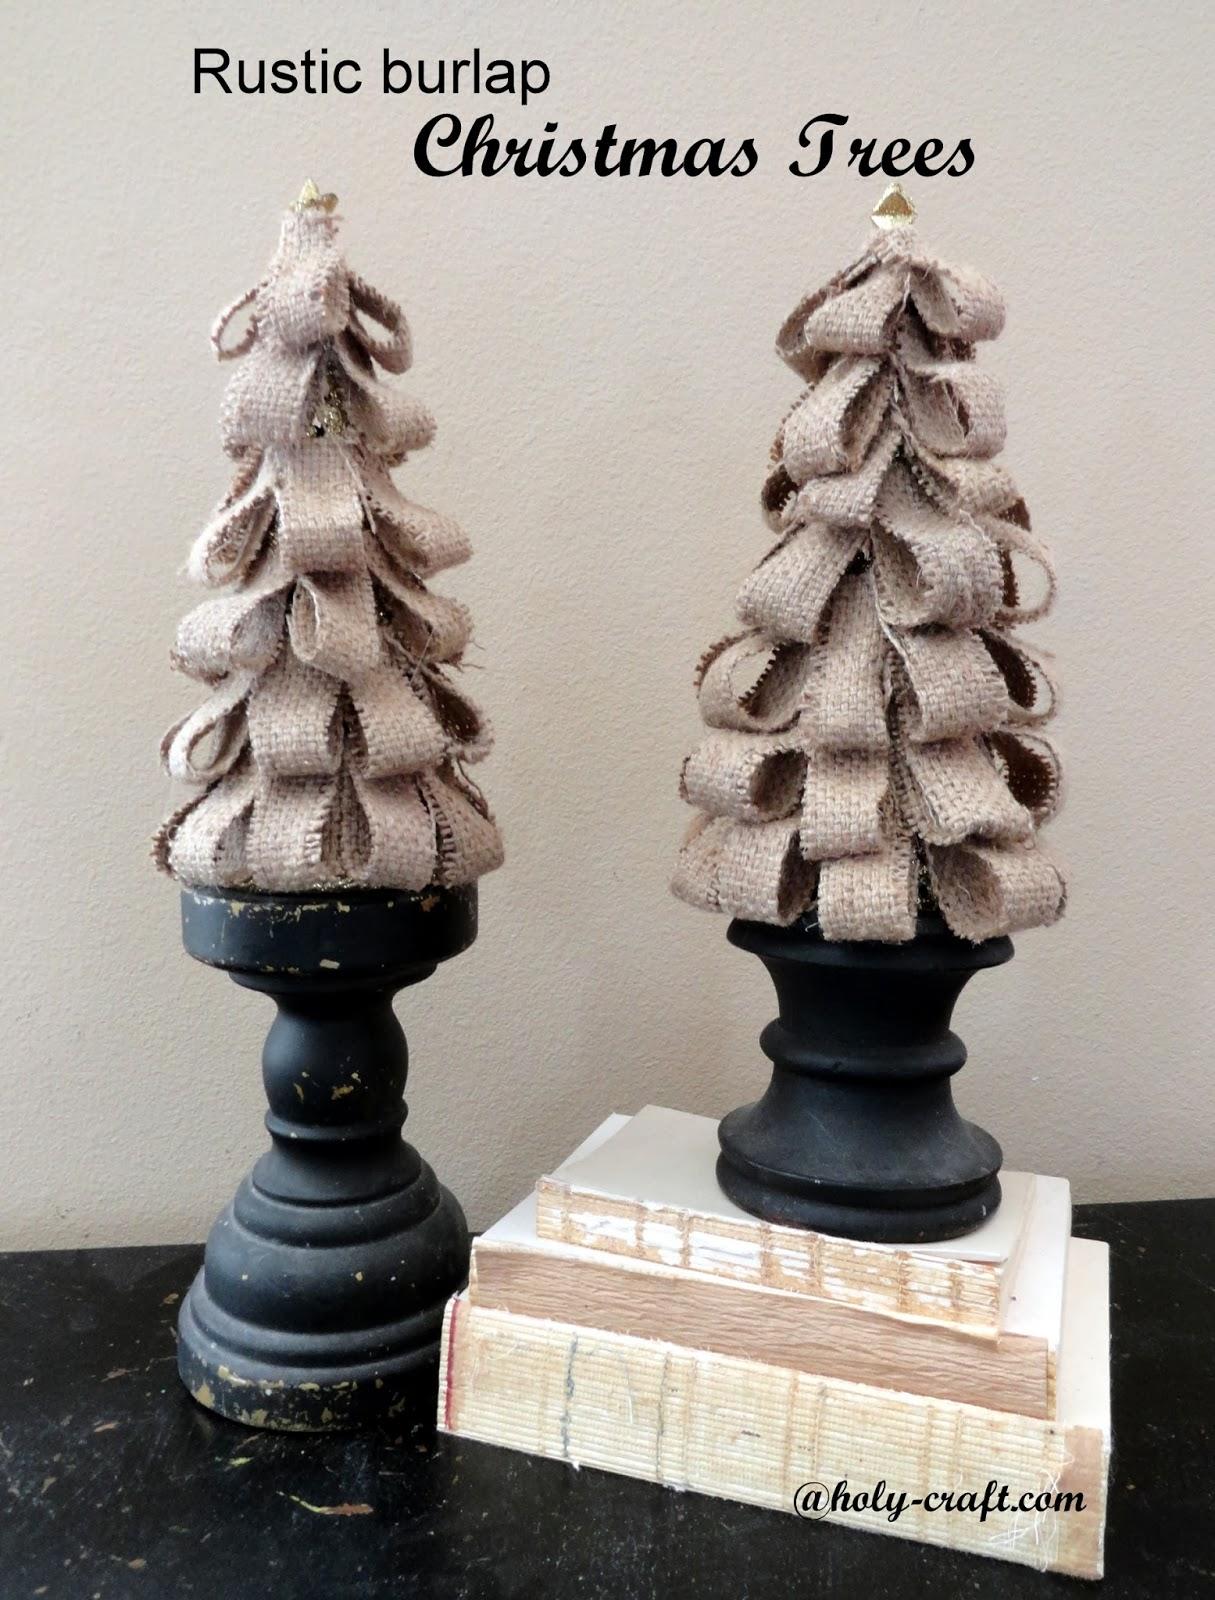 Rustic Burlap Christmas trees